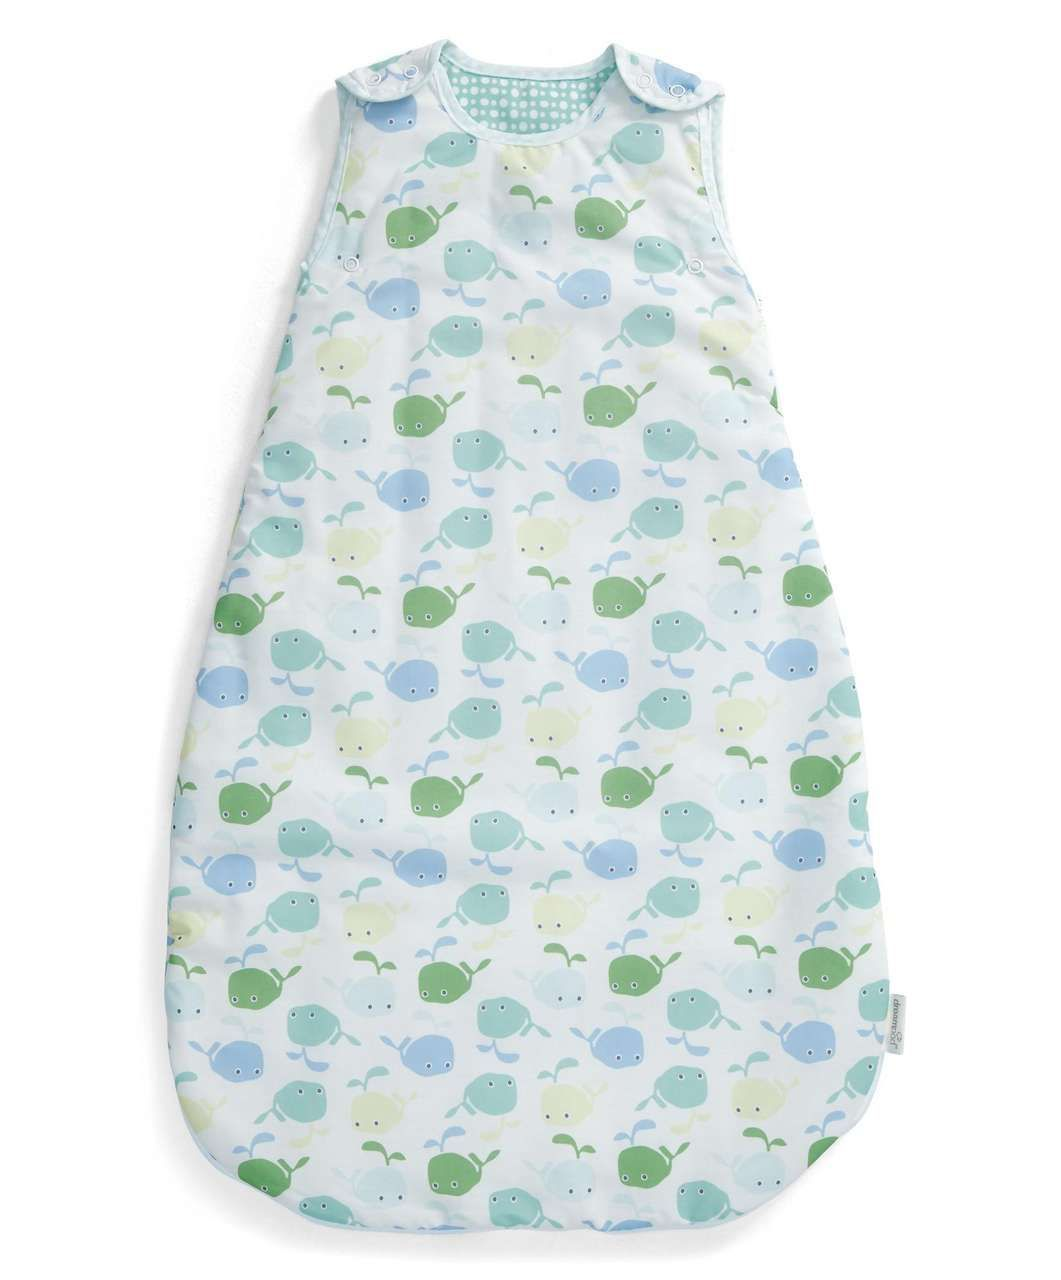 quality design c1246 c9ac2 Bubble Blue - Dreampod Sleep Bag 0-6 months 2.5 tog - Offers ...